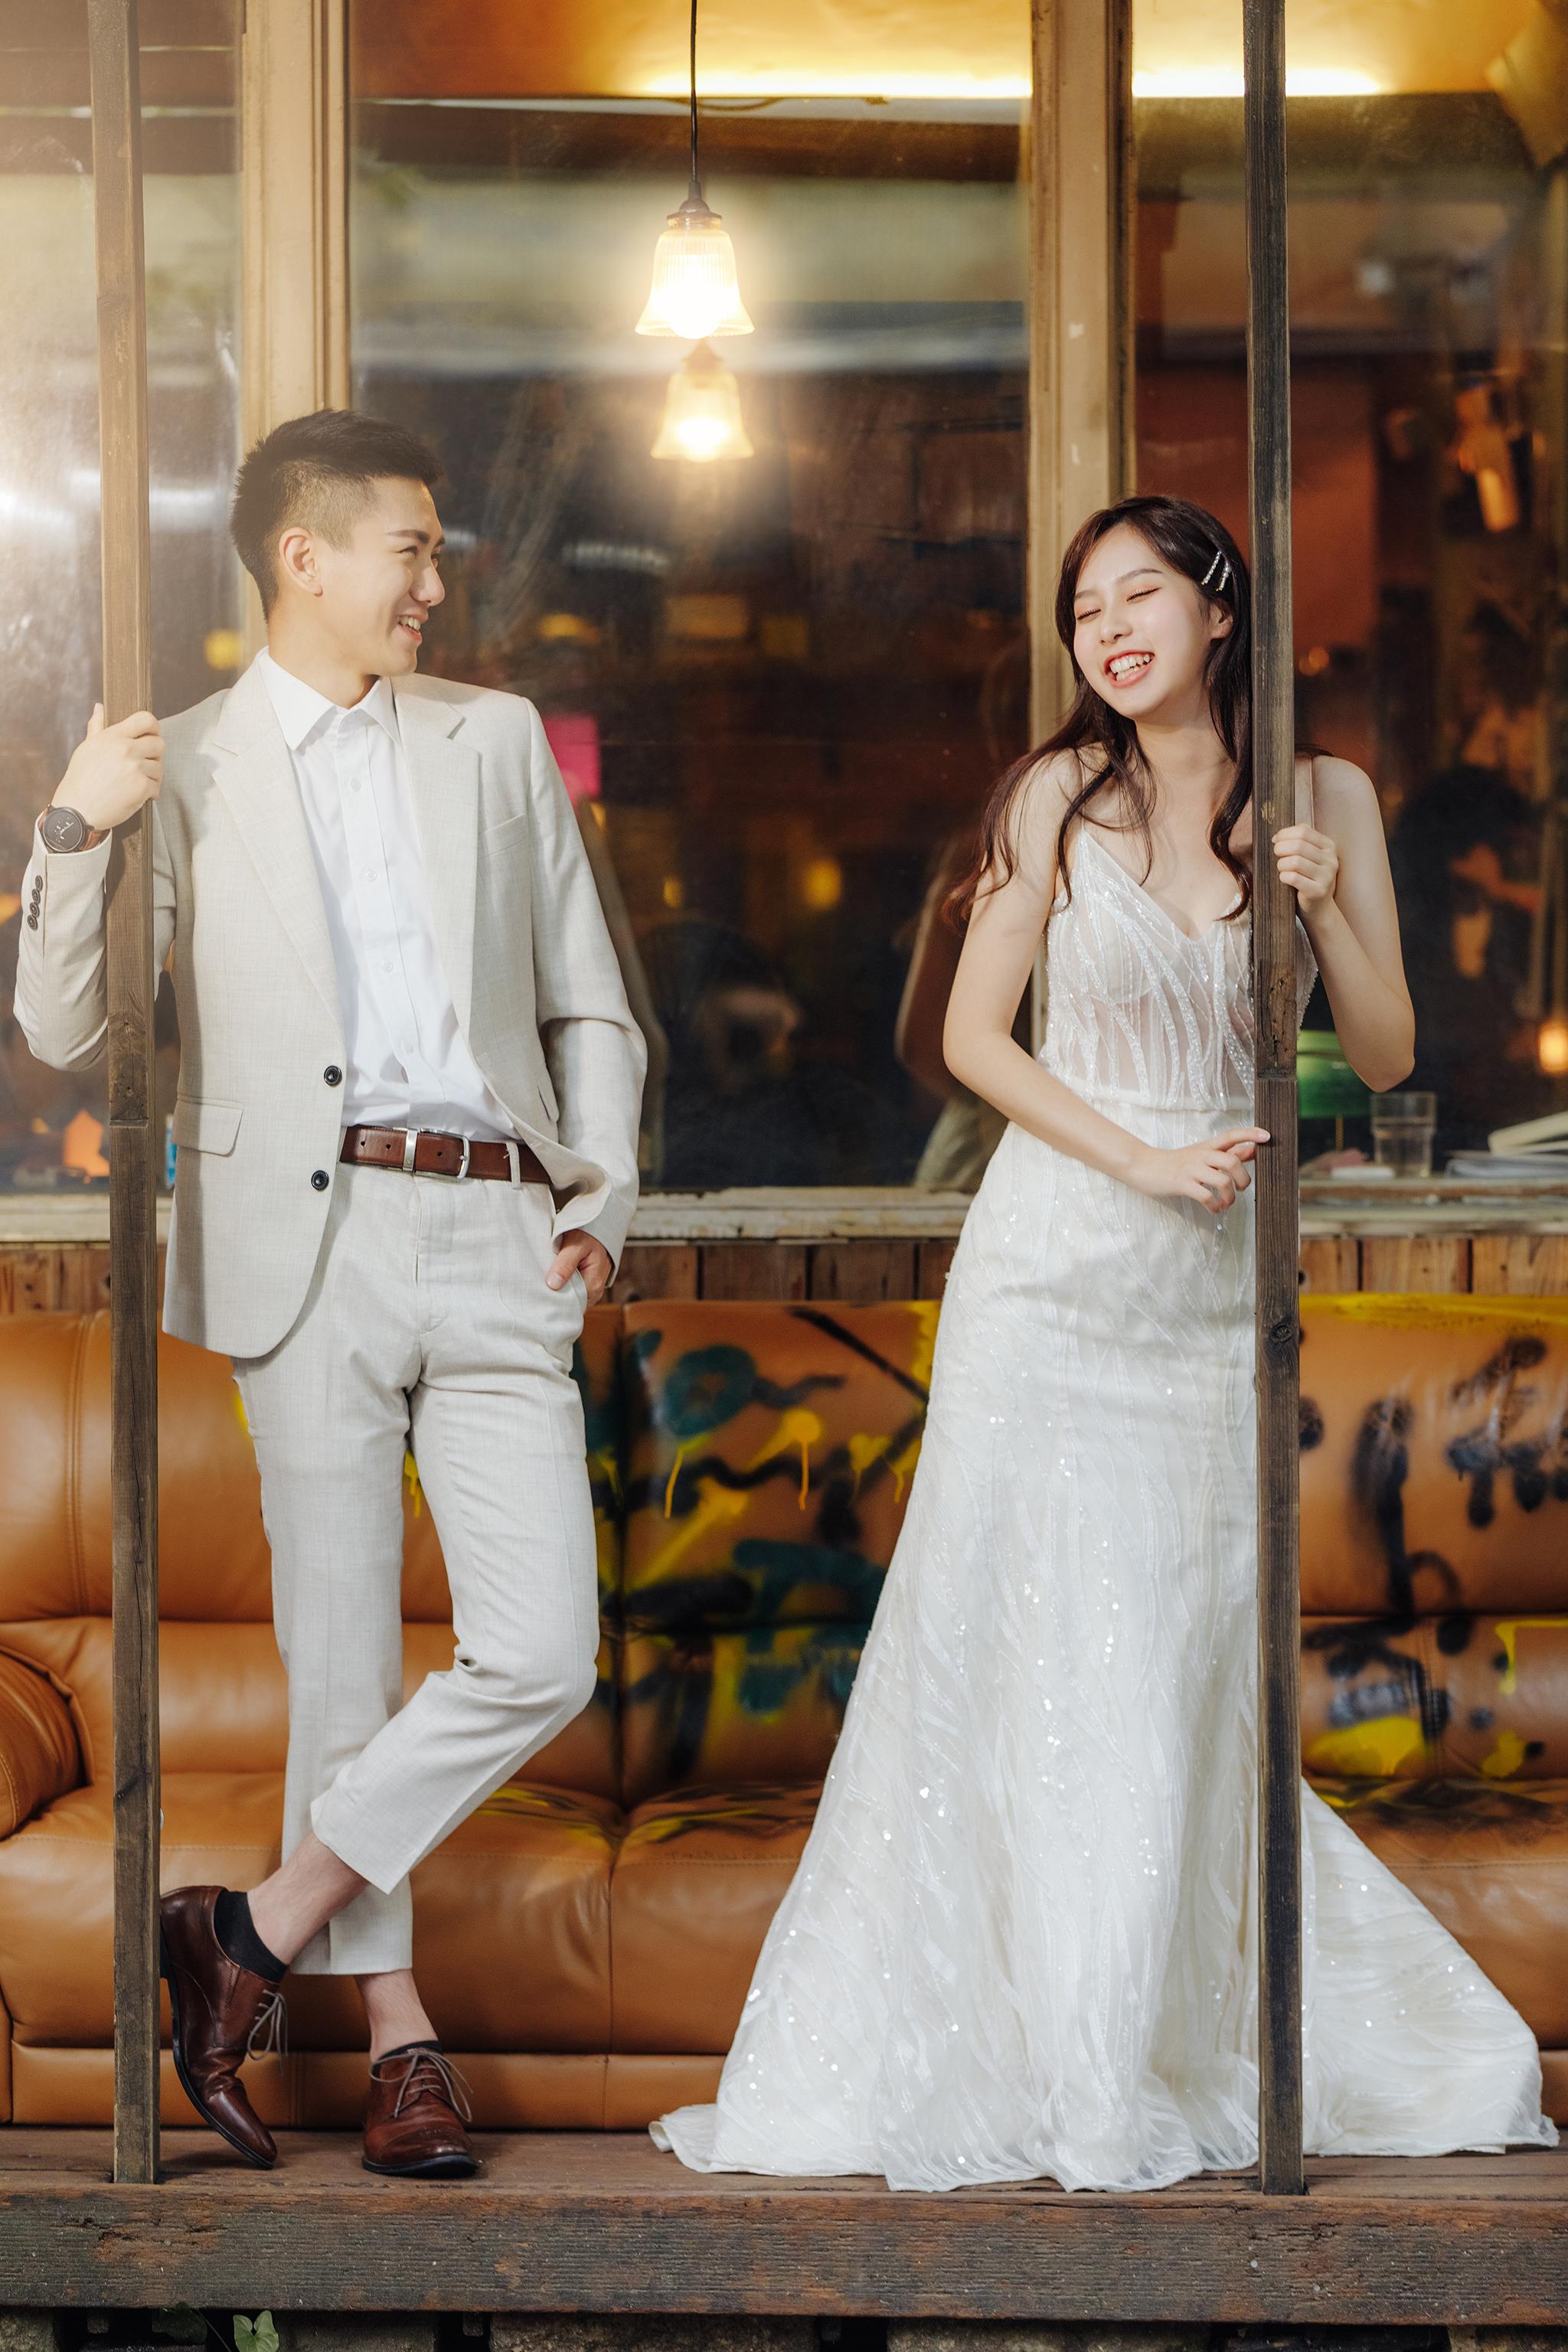 47985616951 d9462b80f4 o - 【自主婚紗】+Jared & Arina+